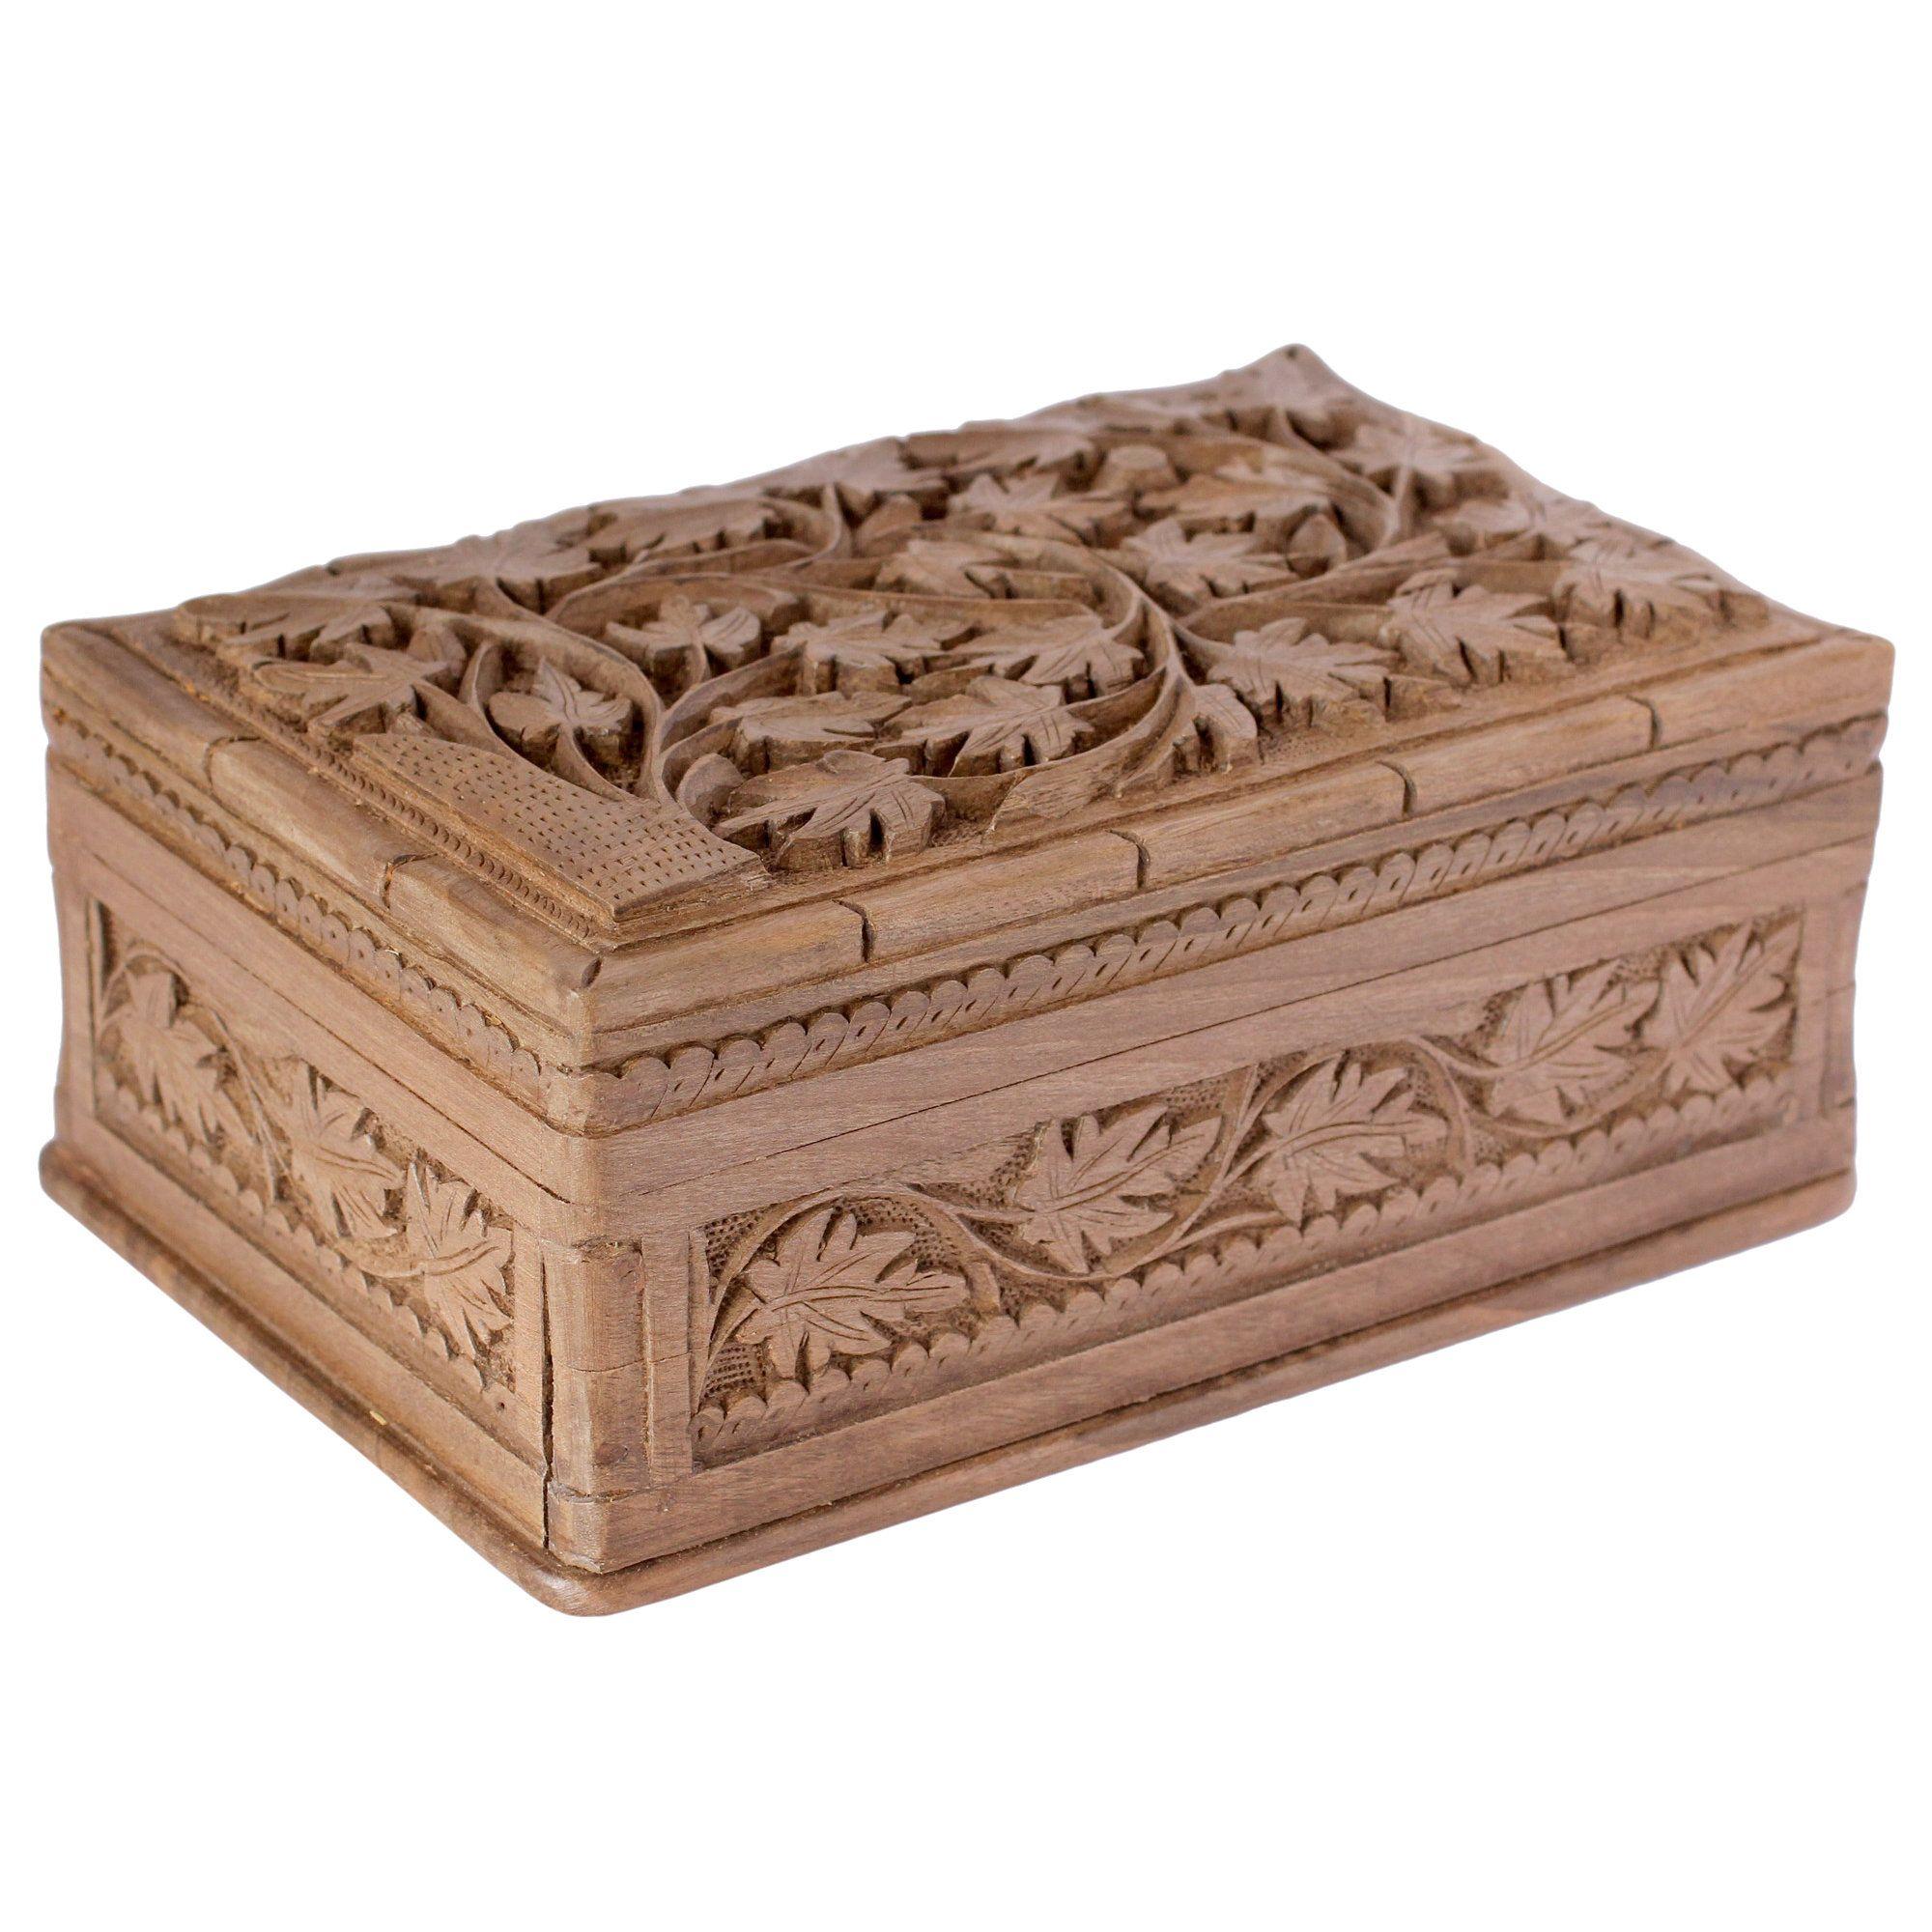 M Ayub Artisan Ivy Fantasy Jewelry Box Wood Jewelry Box Jewelry Box Wooden Jewelry Boxes